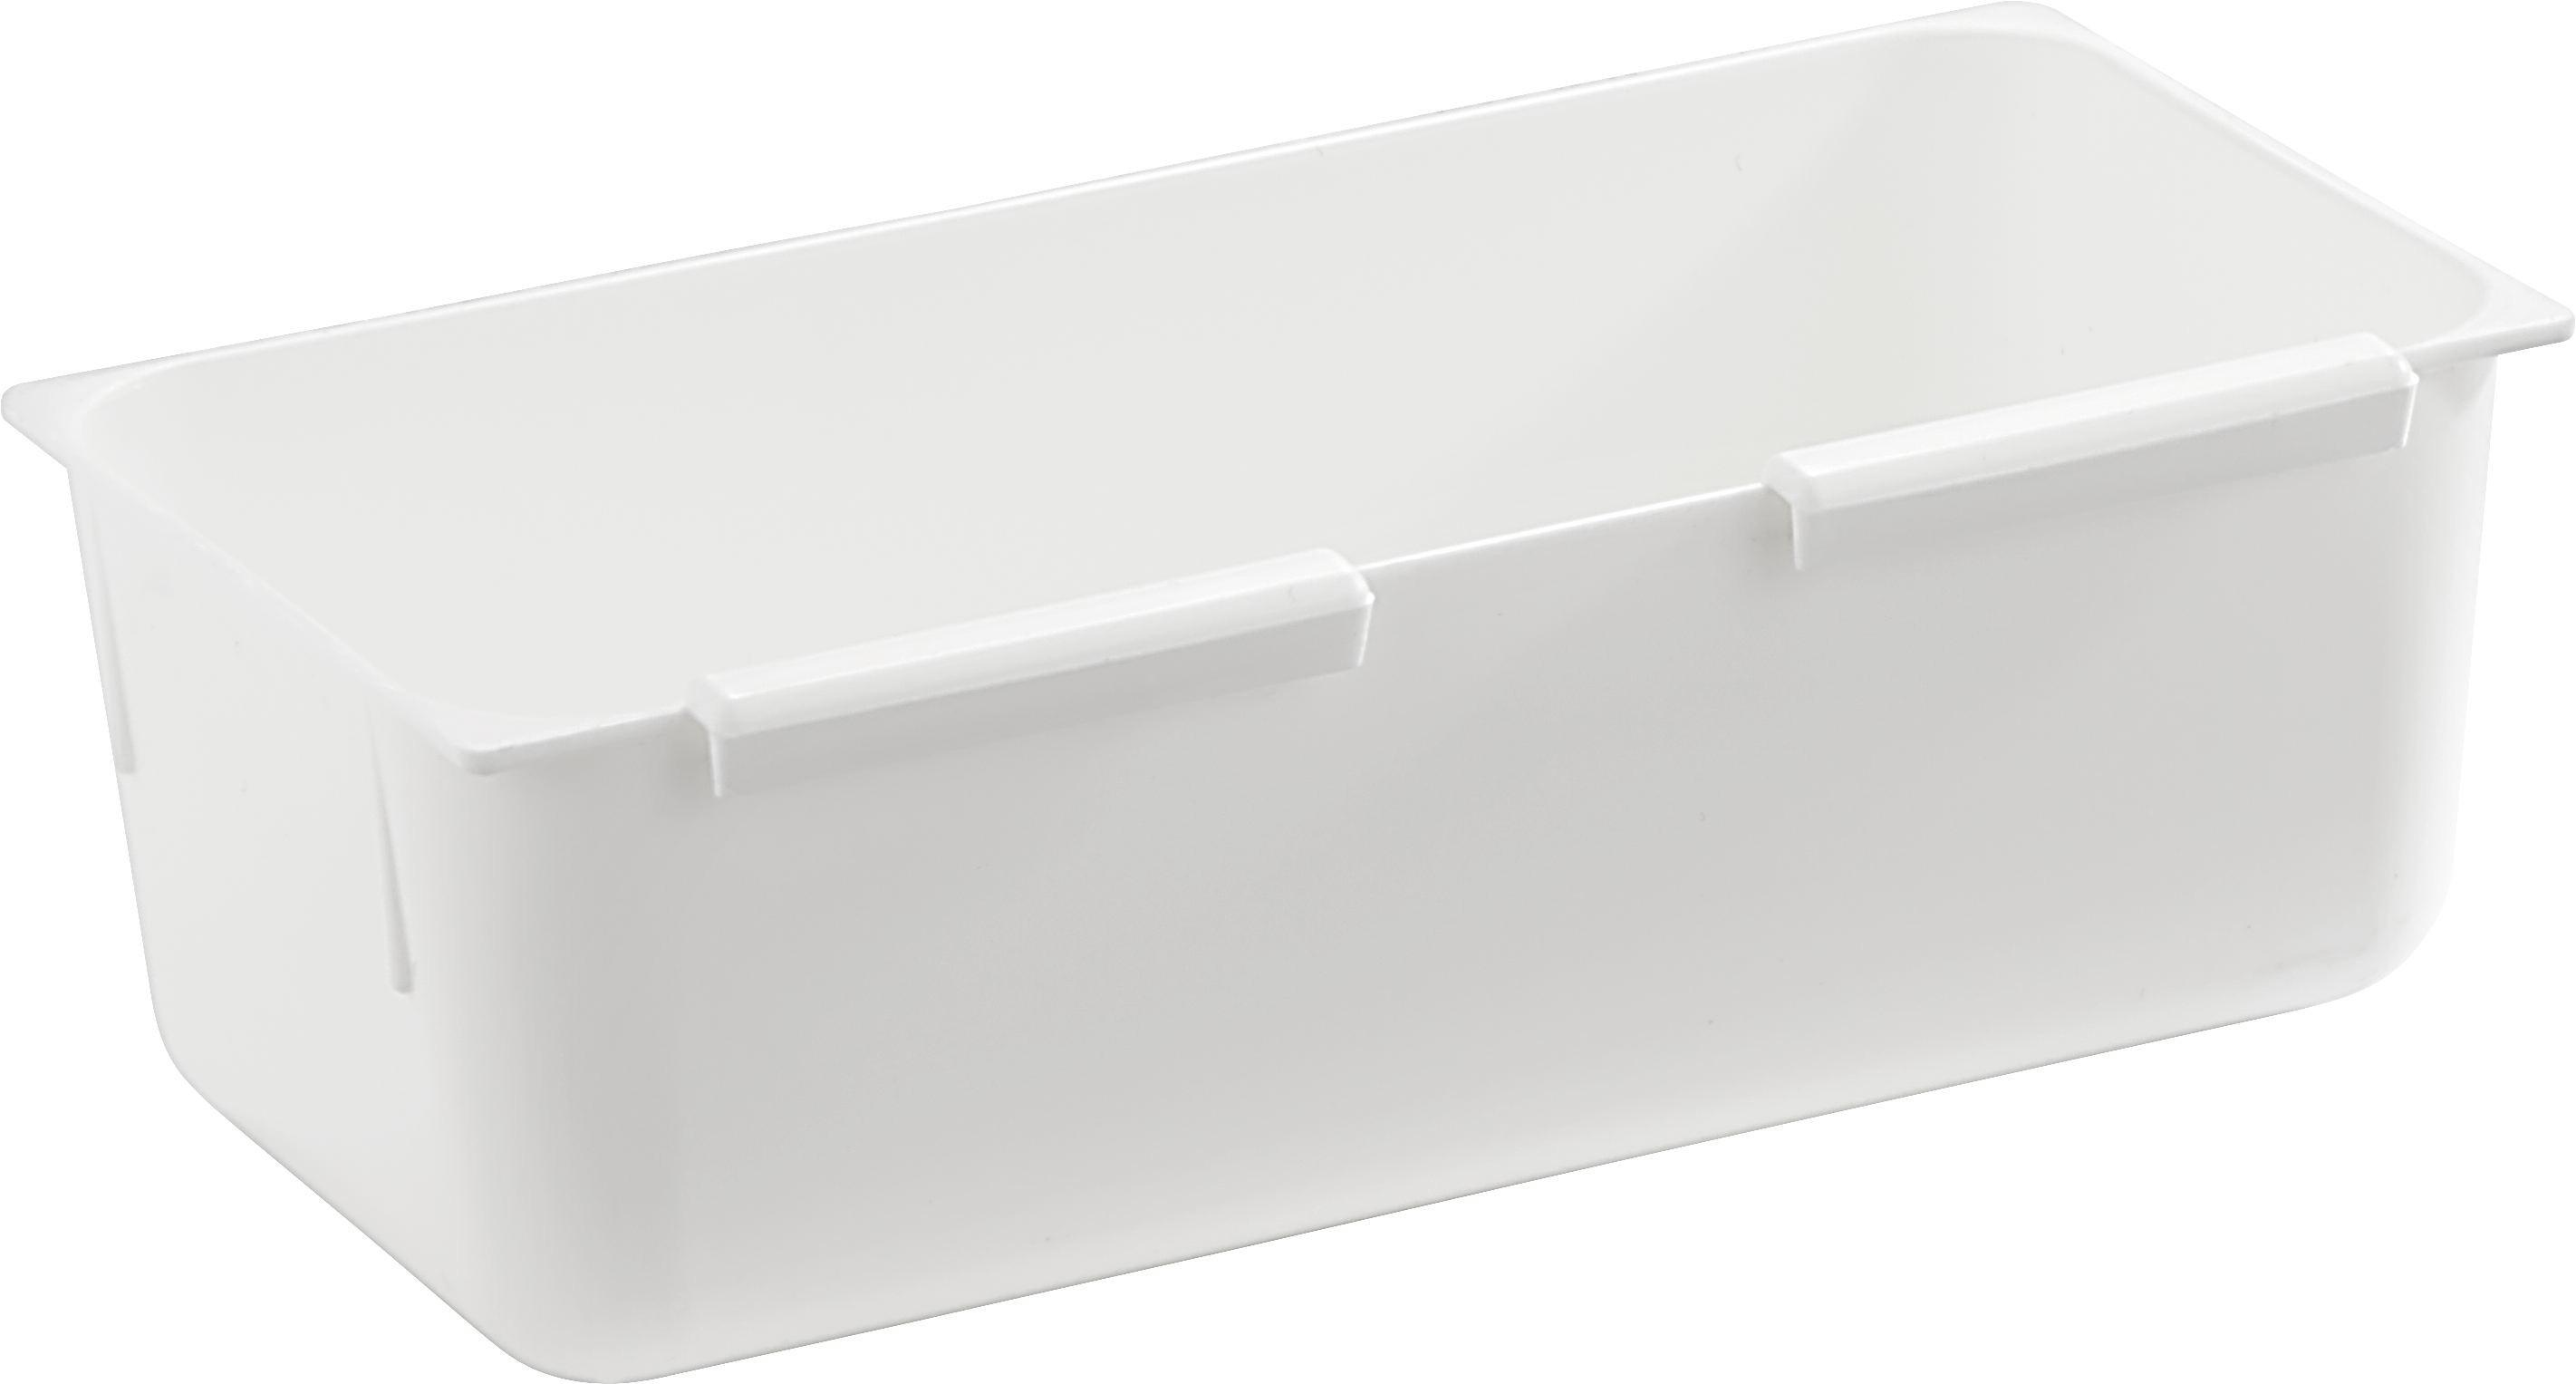 Schubladenbox Wanda in Weiß, ca. 7,5x15cm - Weiß, Kunststoff (7,5/15cm) - MÖMAX modern living